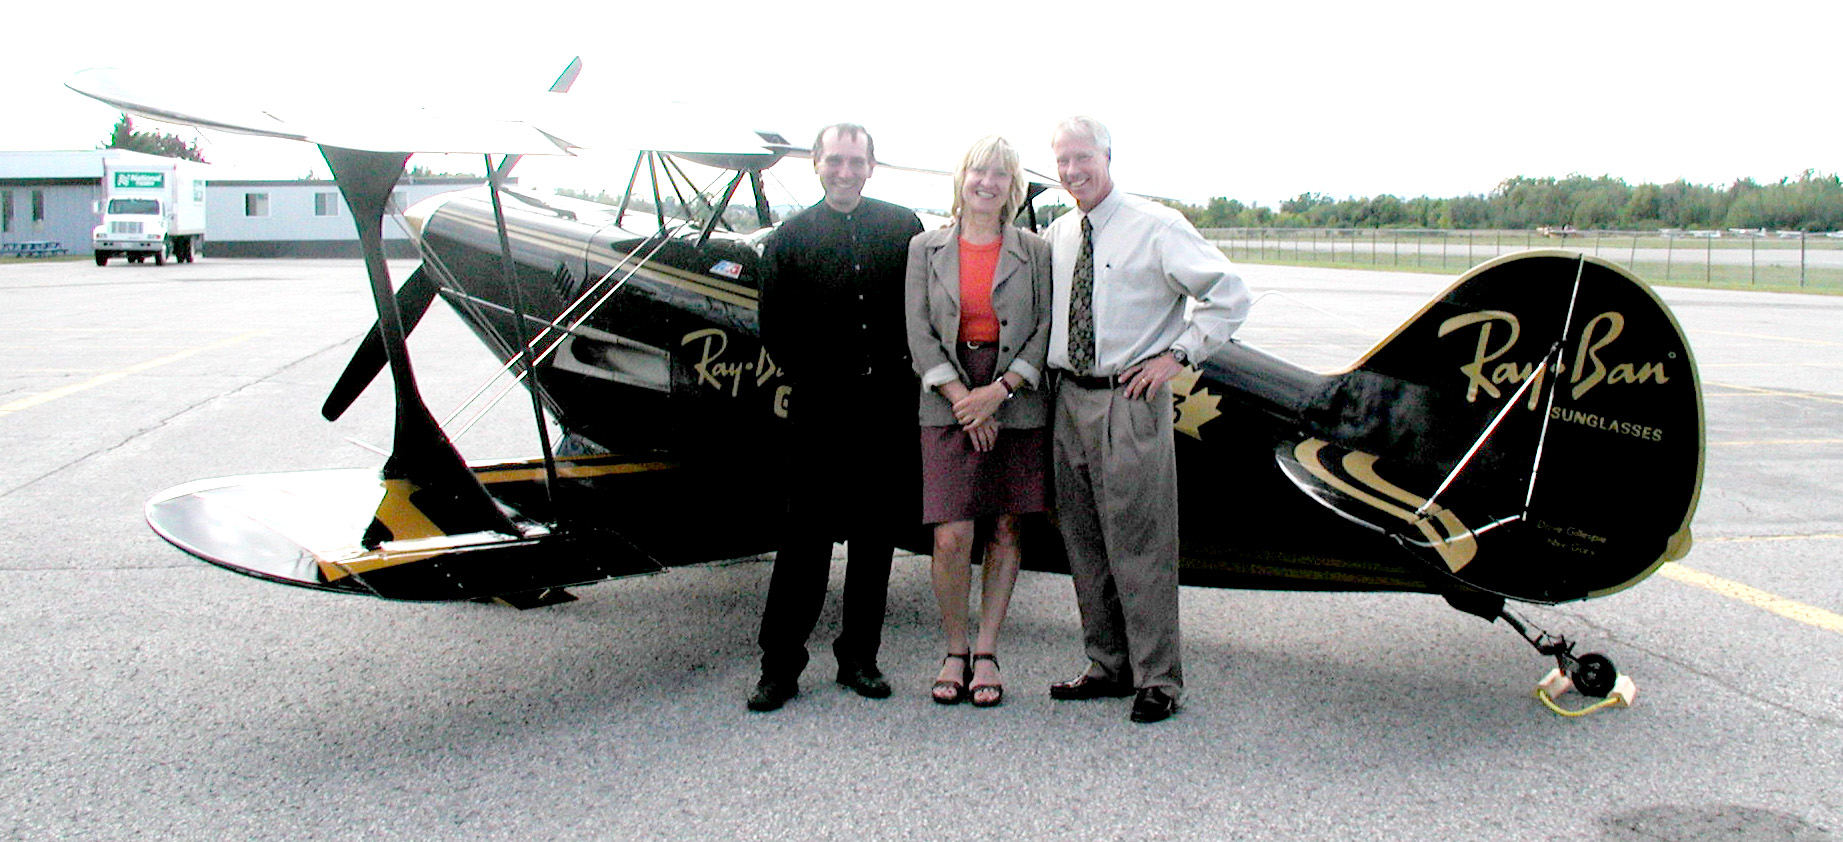 ray ban gold aerobatic team